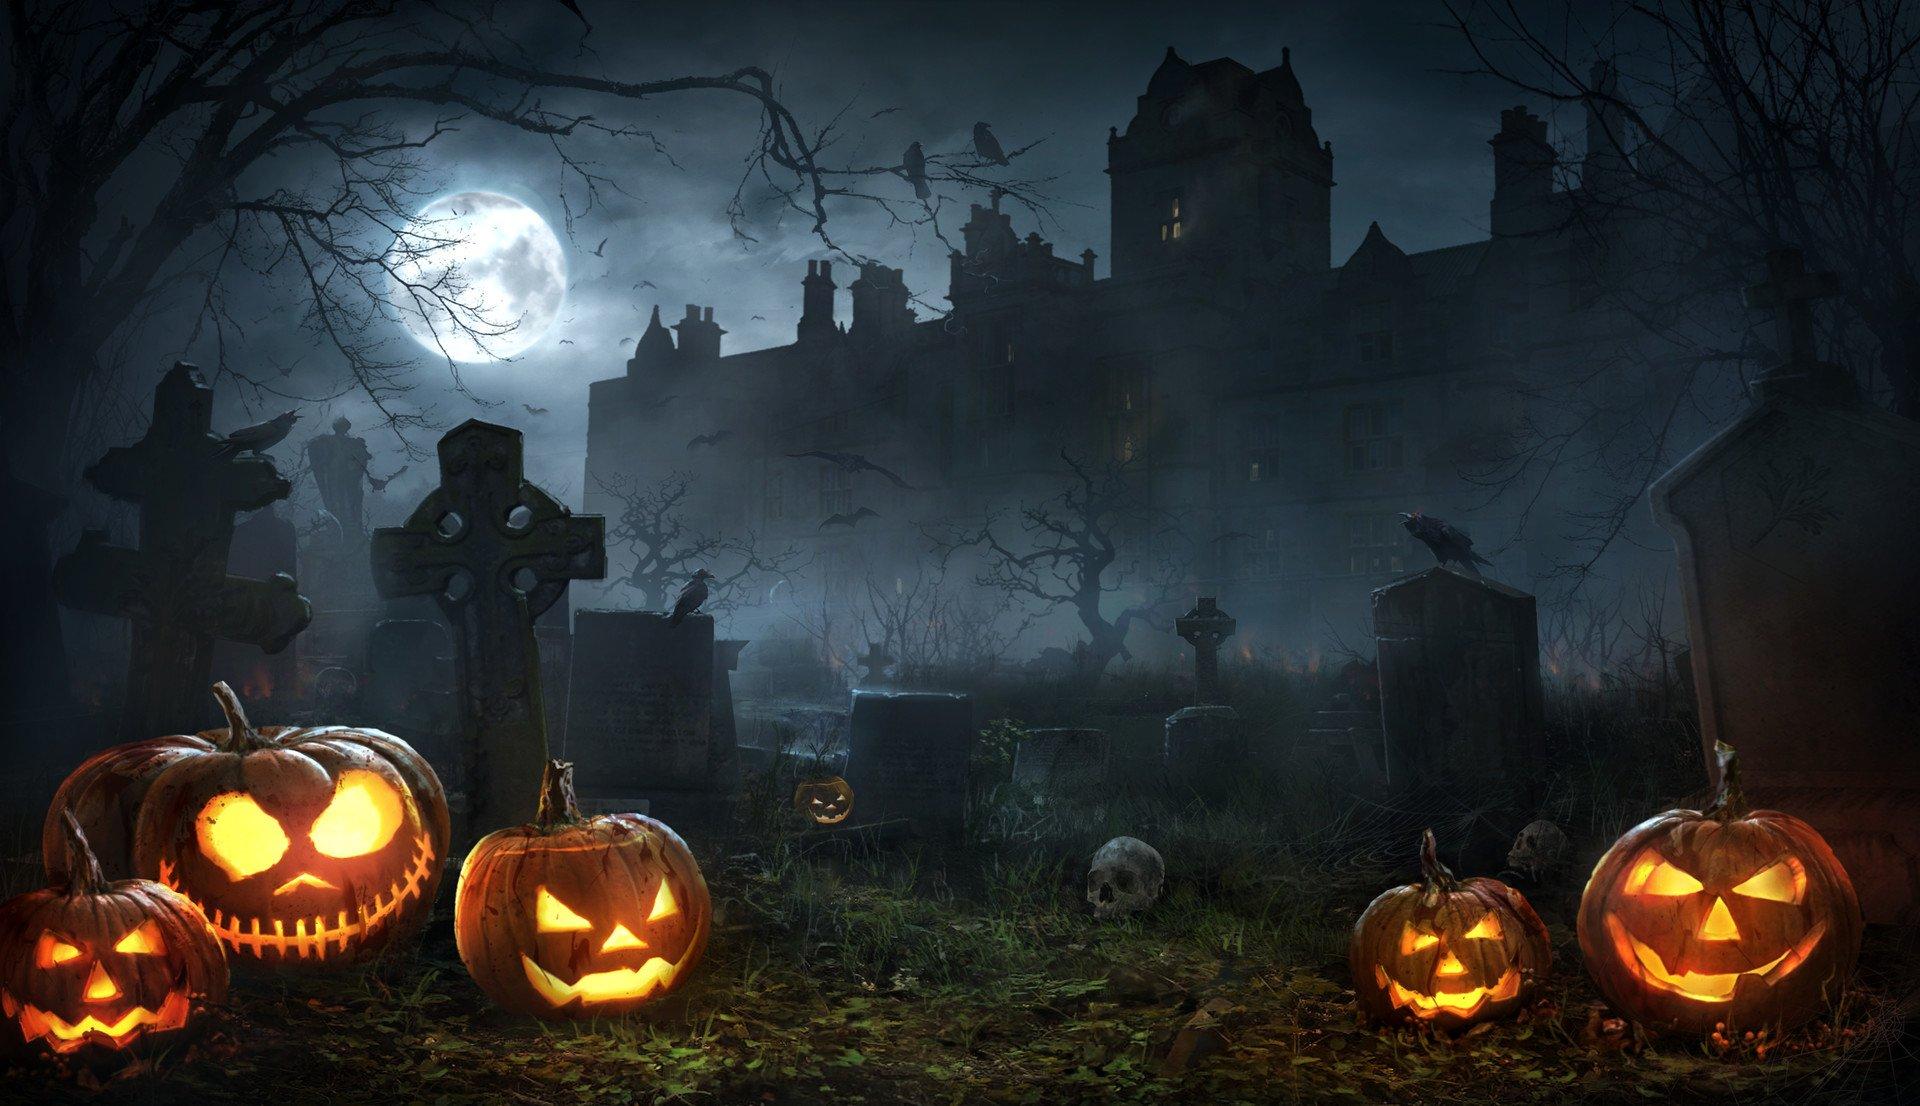 Halloween Night in Graveyard HD Wallpaper Background Image 1920x1106